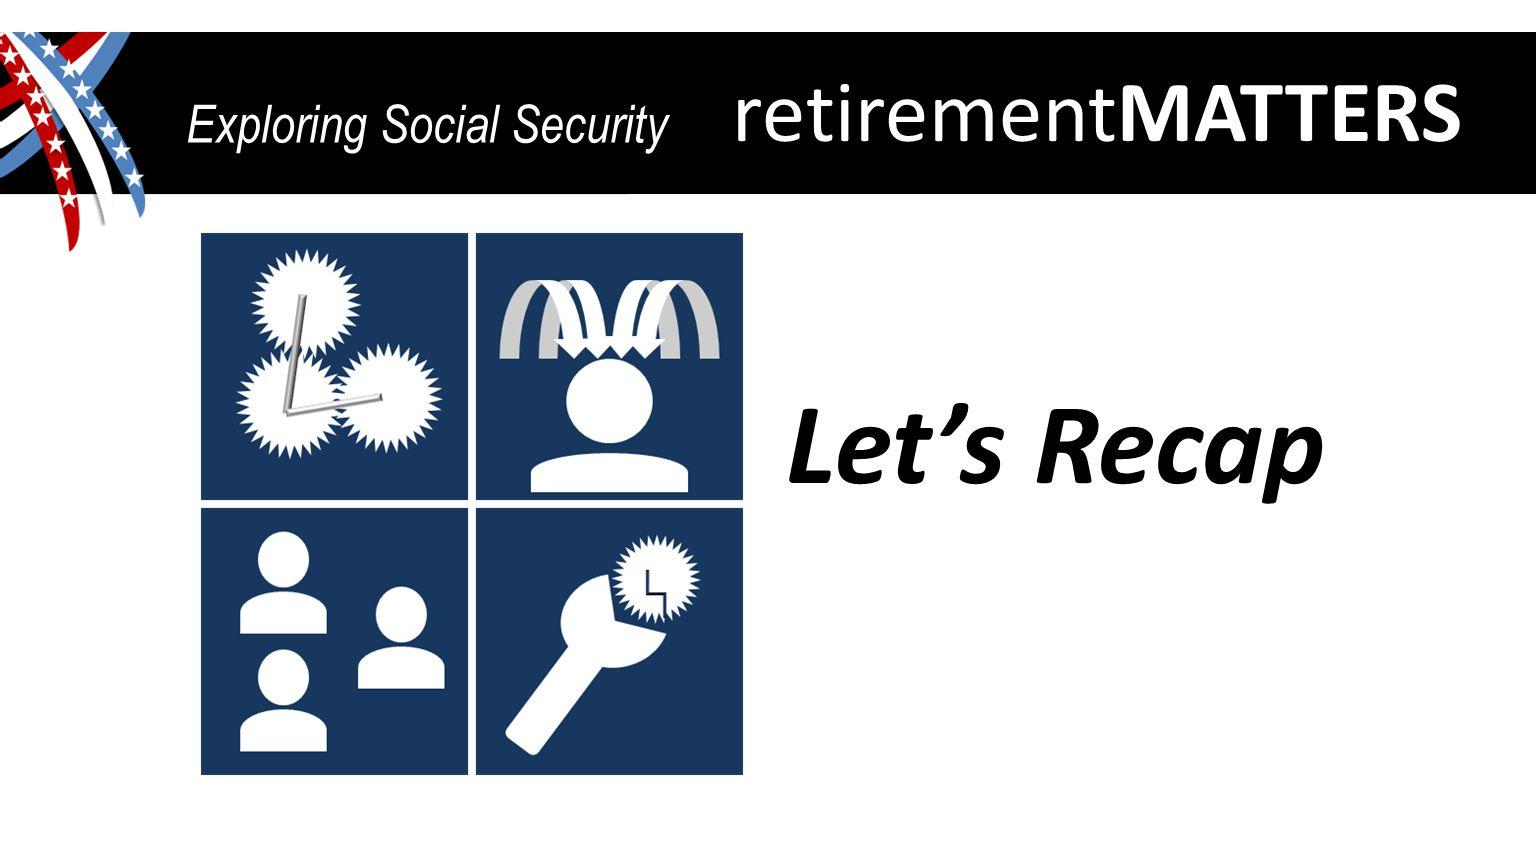 retirementMATTERS Exploring Social Security Let's Recap